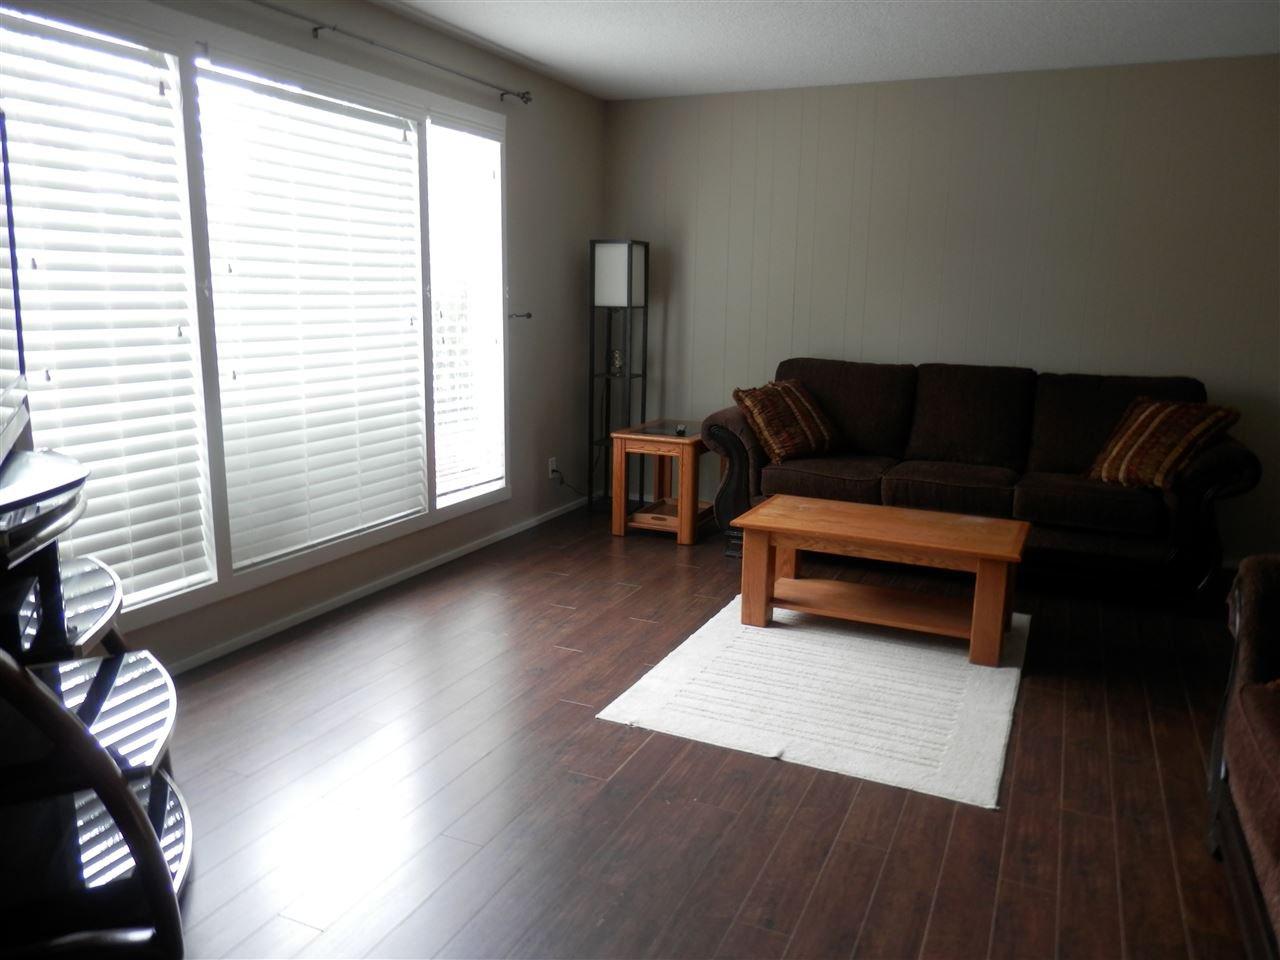 Photo 3: Photos: 779 PIGEON Avenue in Williams Lake: Williams Lake - City House for sale (Williams Lake (Zone 27))  : MLS®# R2499311